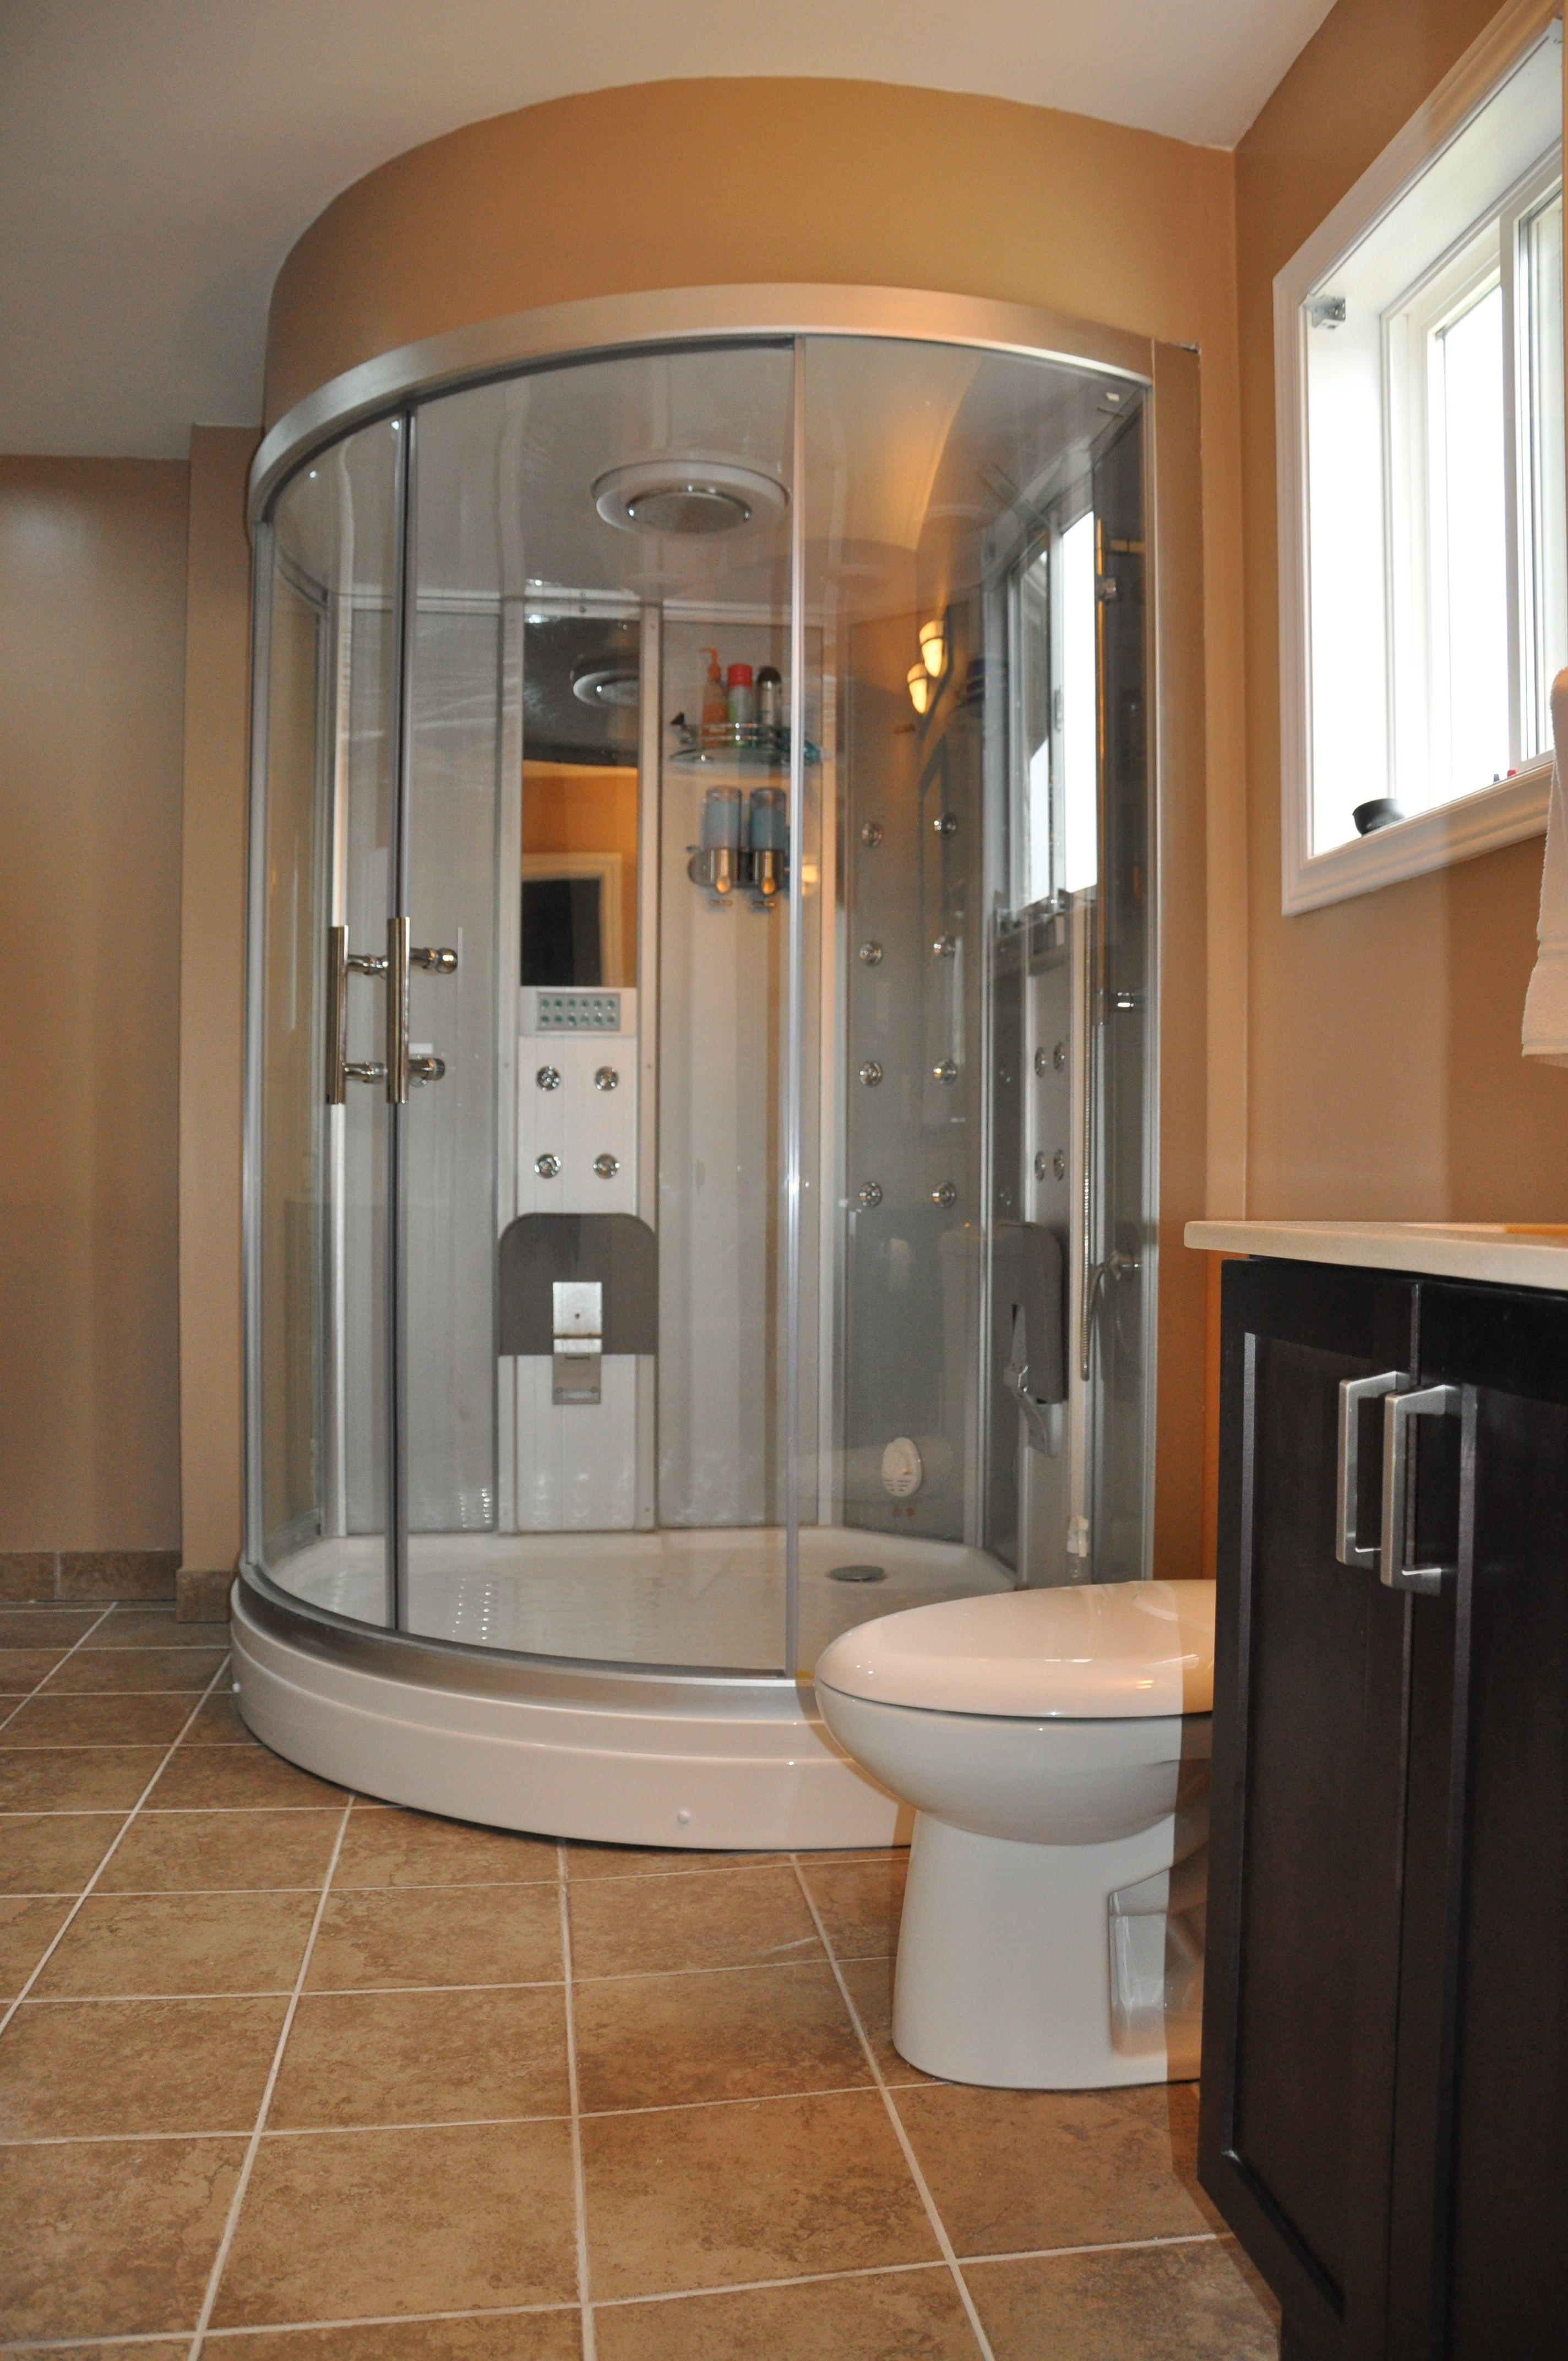 full phenomenal ariel shower insert althase inspirations moen size bath valencia steam hot kohler insertsteam generator photo enclosure pdf of bathroomoweraped instructions